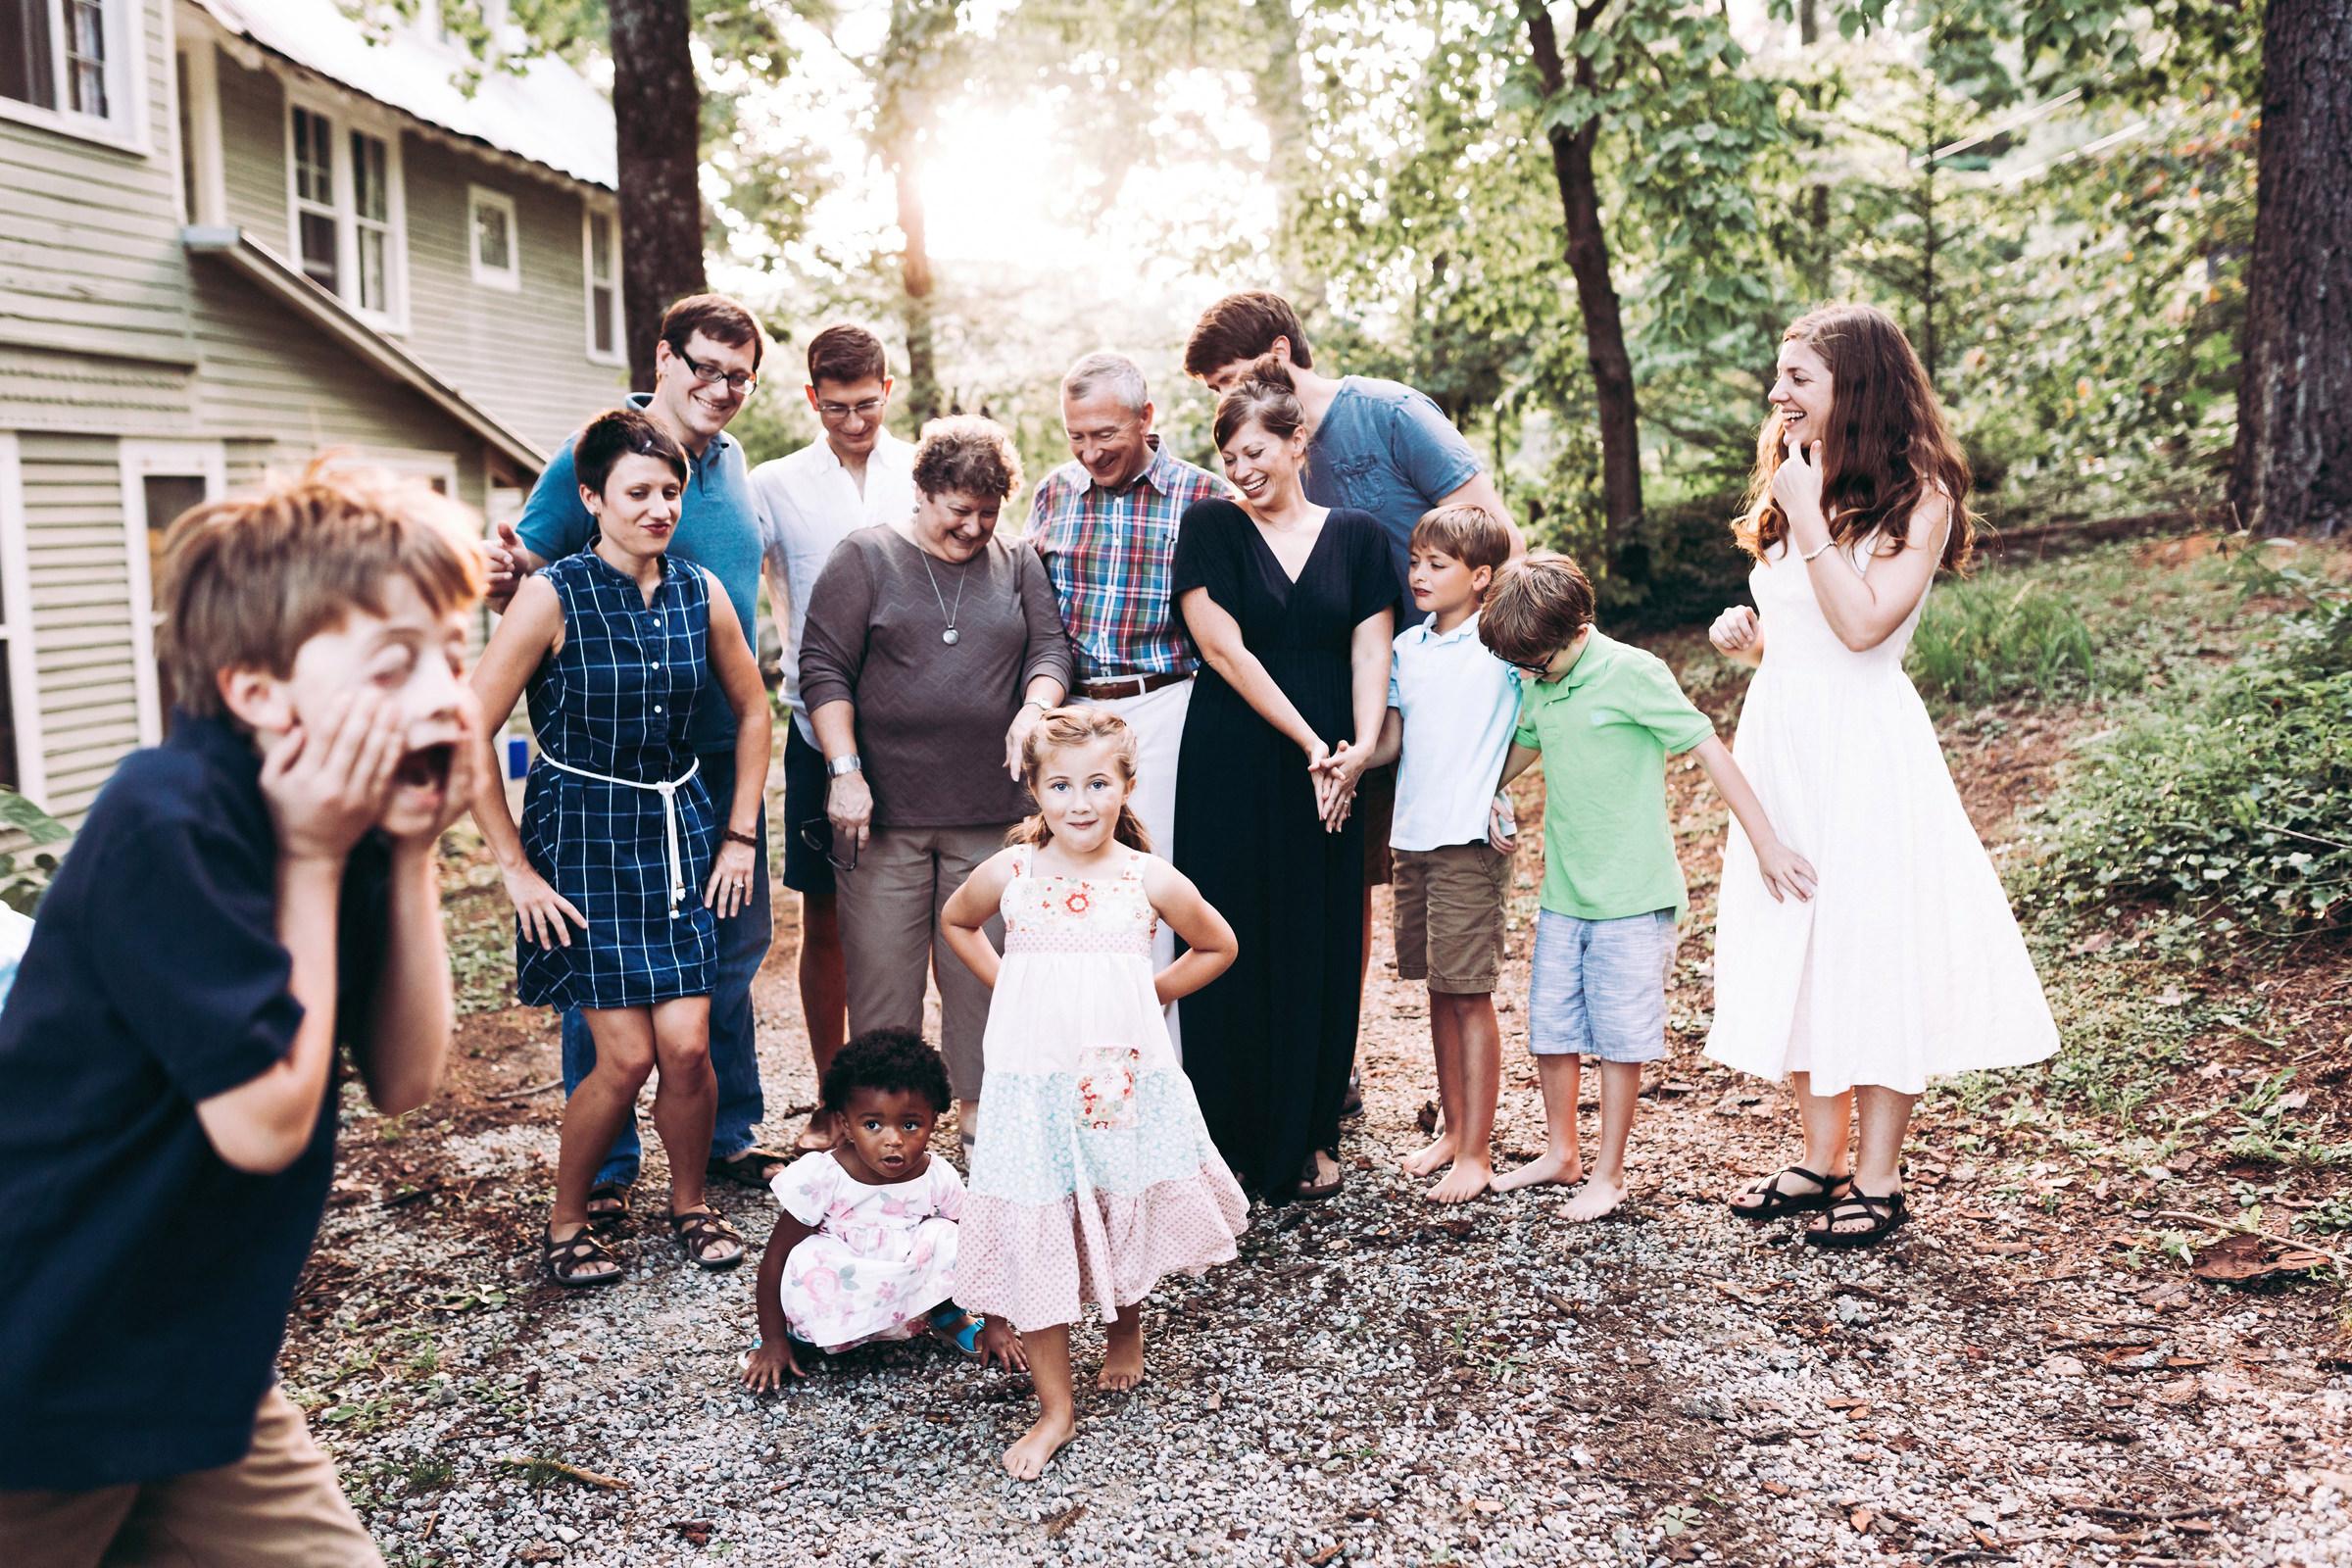 Kentucky_Candid_Wedding_Photographer_078.jpg